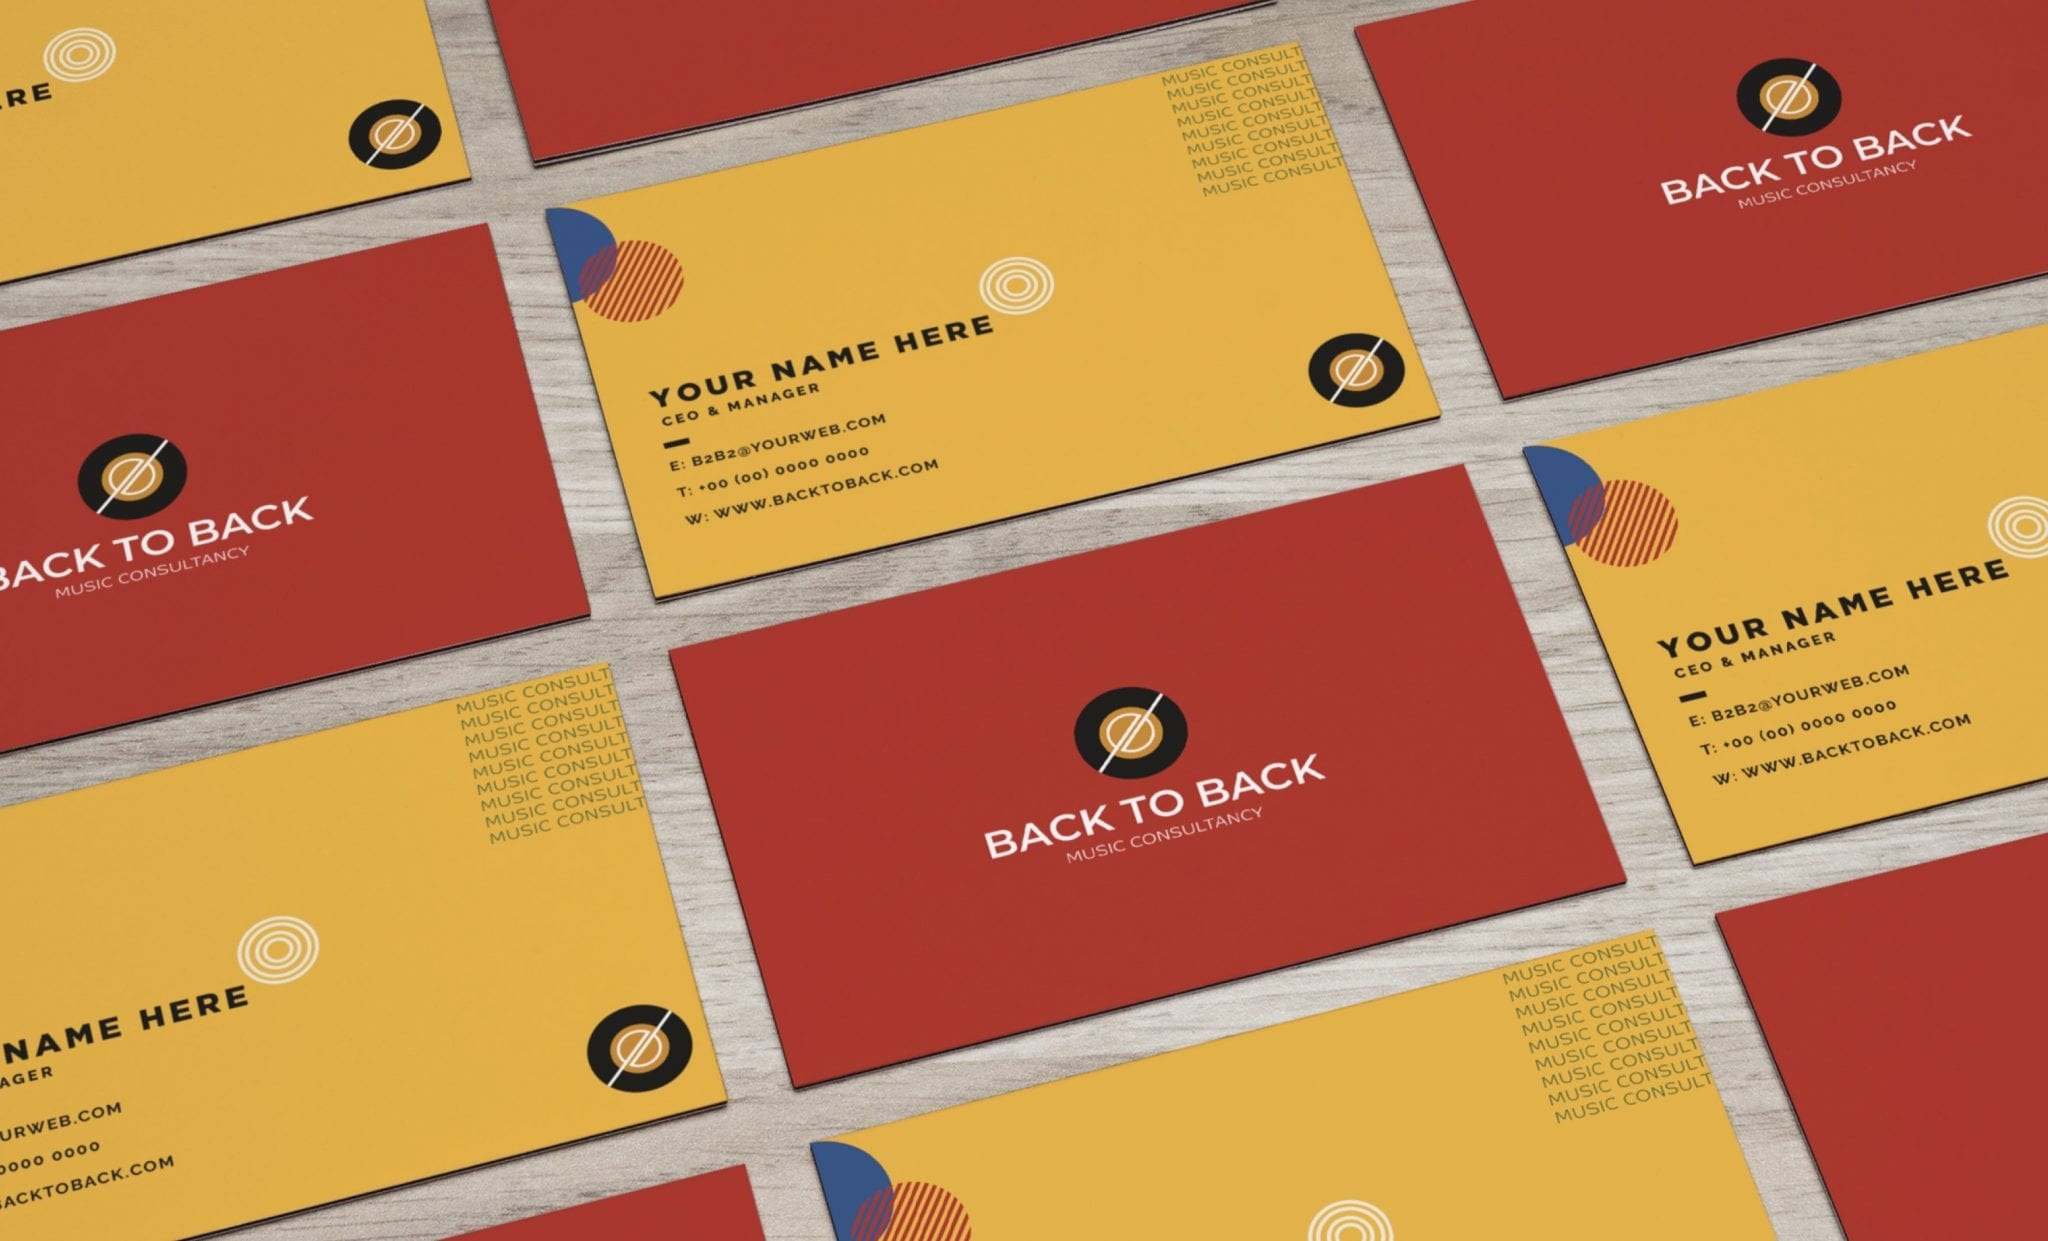 Back to Back Branding Guidelines11